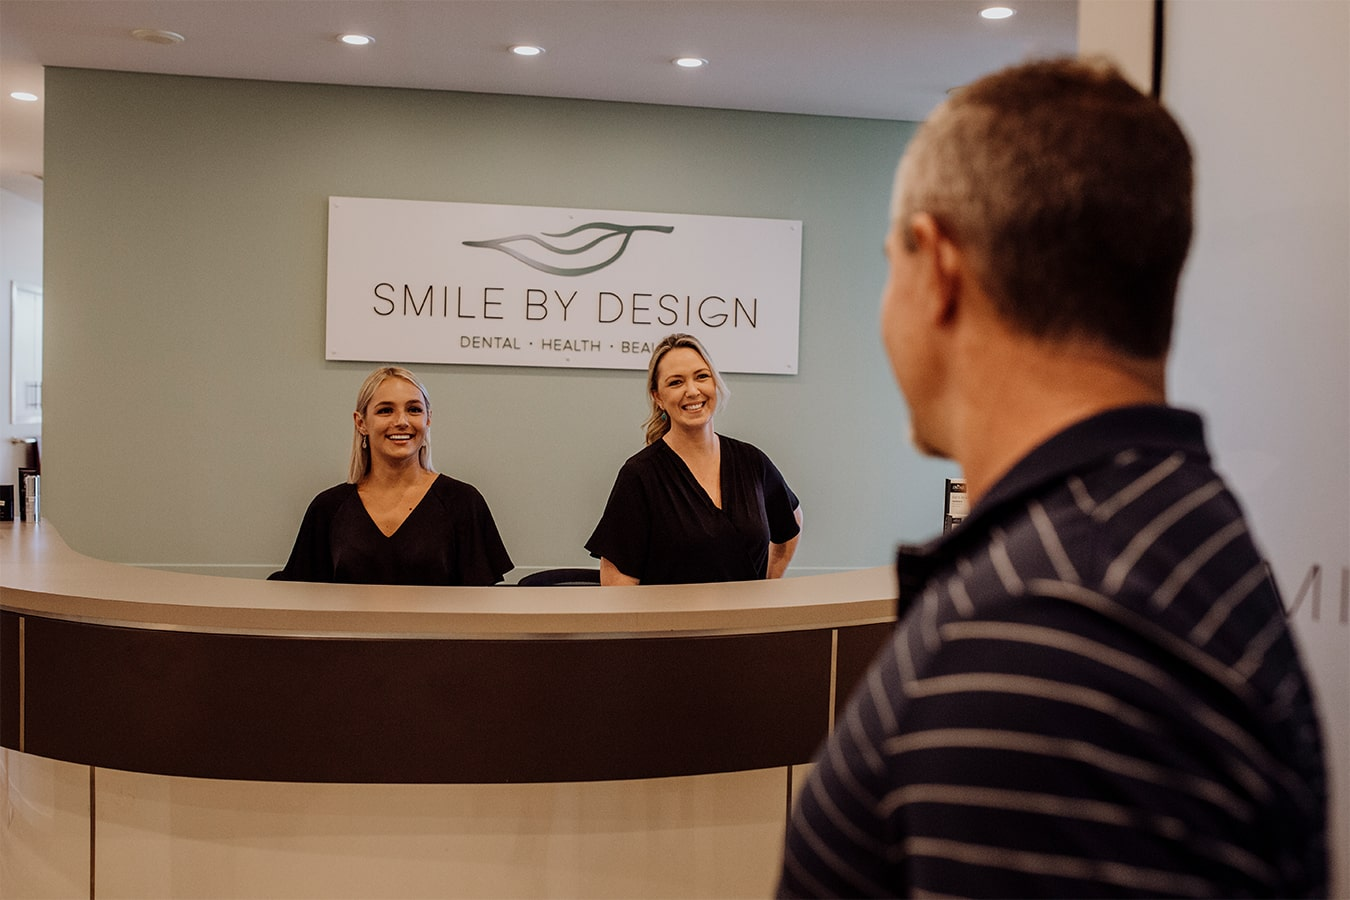 Visit Smile by Design on the Sunshine Coast